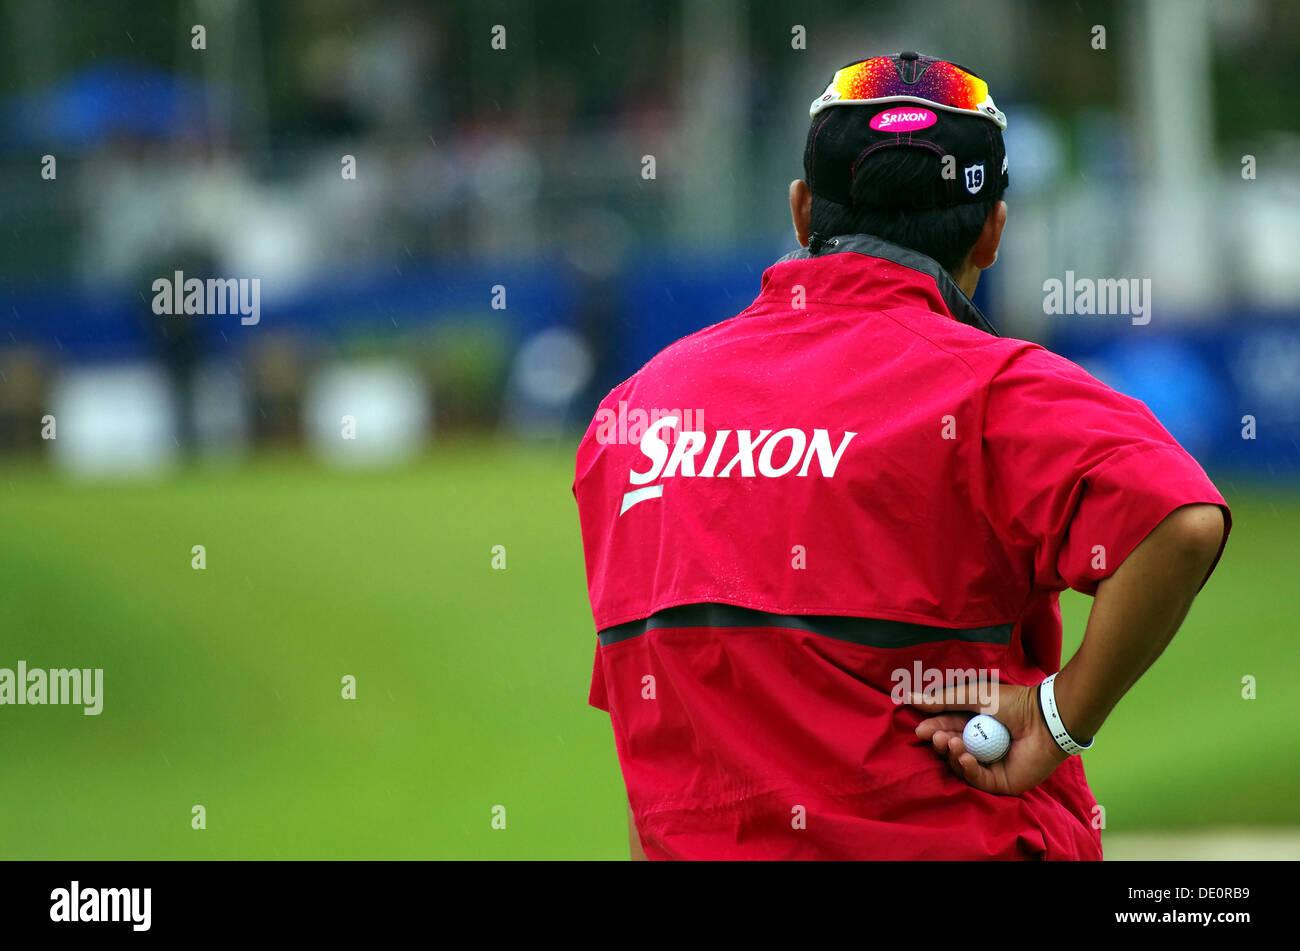 Greensboro, Carolina del Norte, EE.UU. 17 Aug, 2013. Hideki Matsuyama (JPN) Golf : Tercera ronda del Wyndham Championship Foto de stock